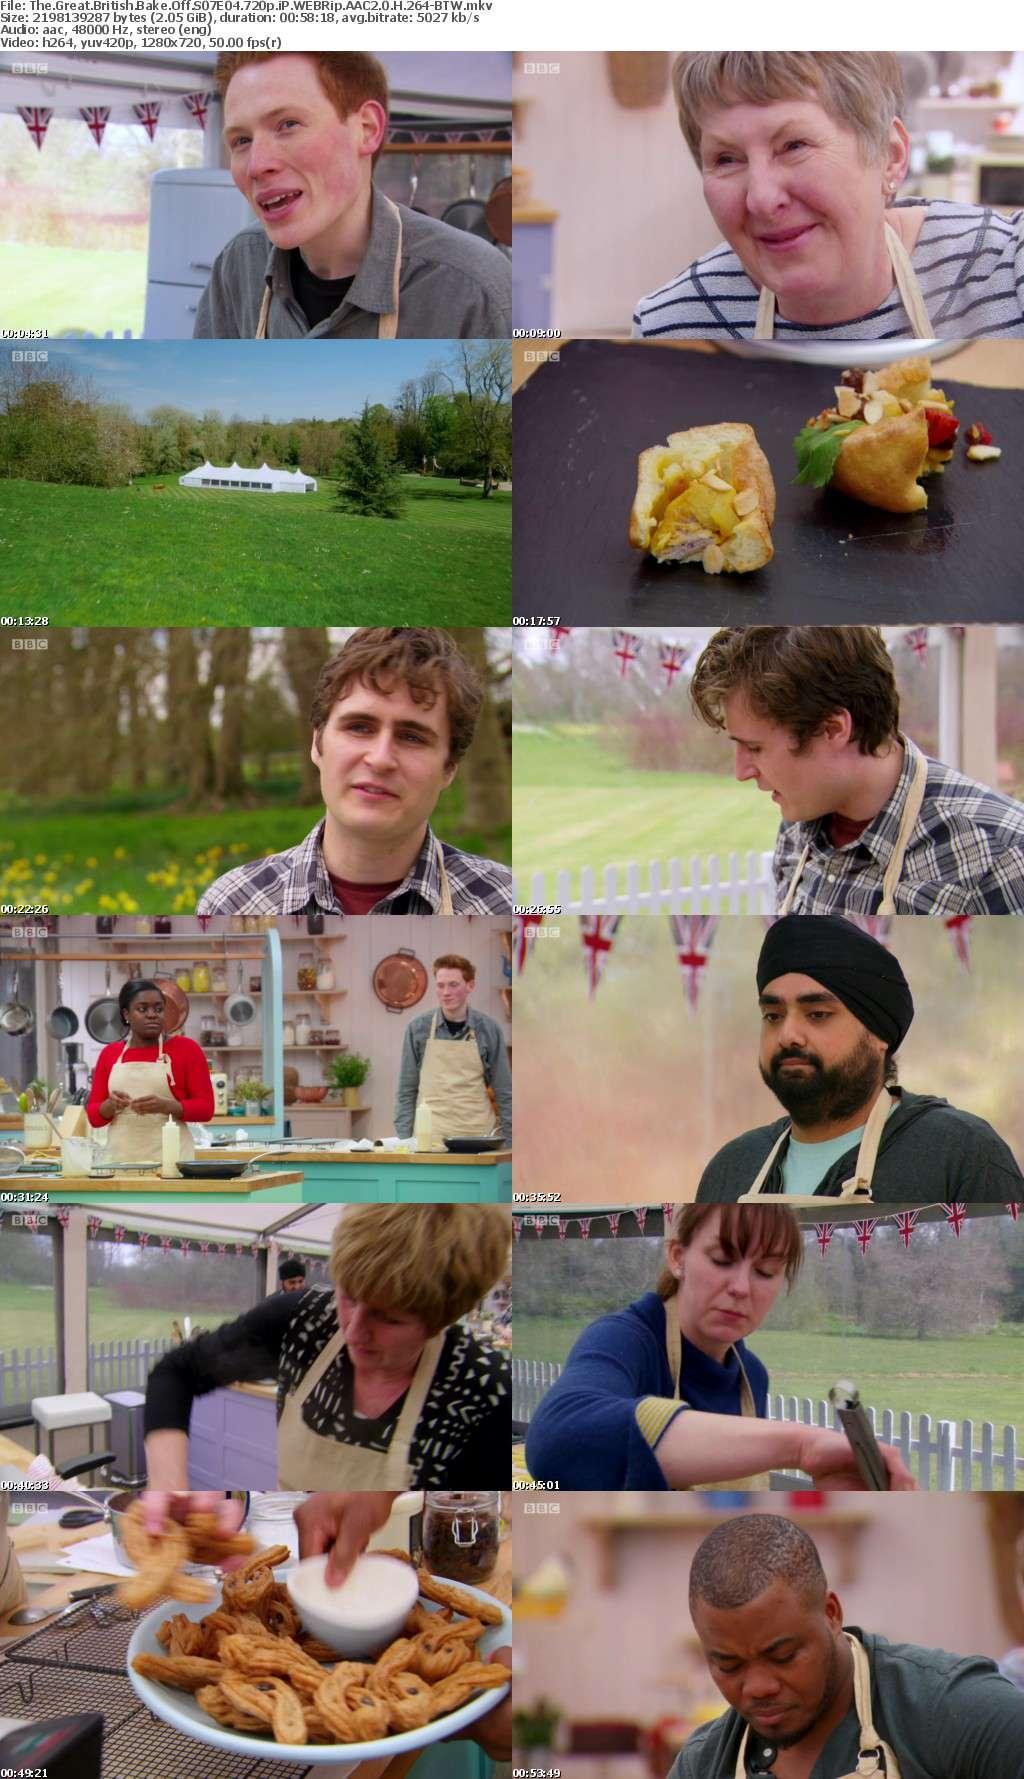 The Great British Bake Off S07E04 720p iP WEBRip AAC2 0 H 264-BTW